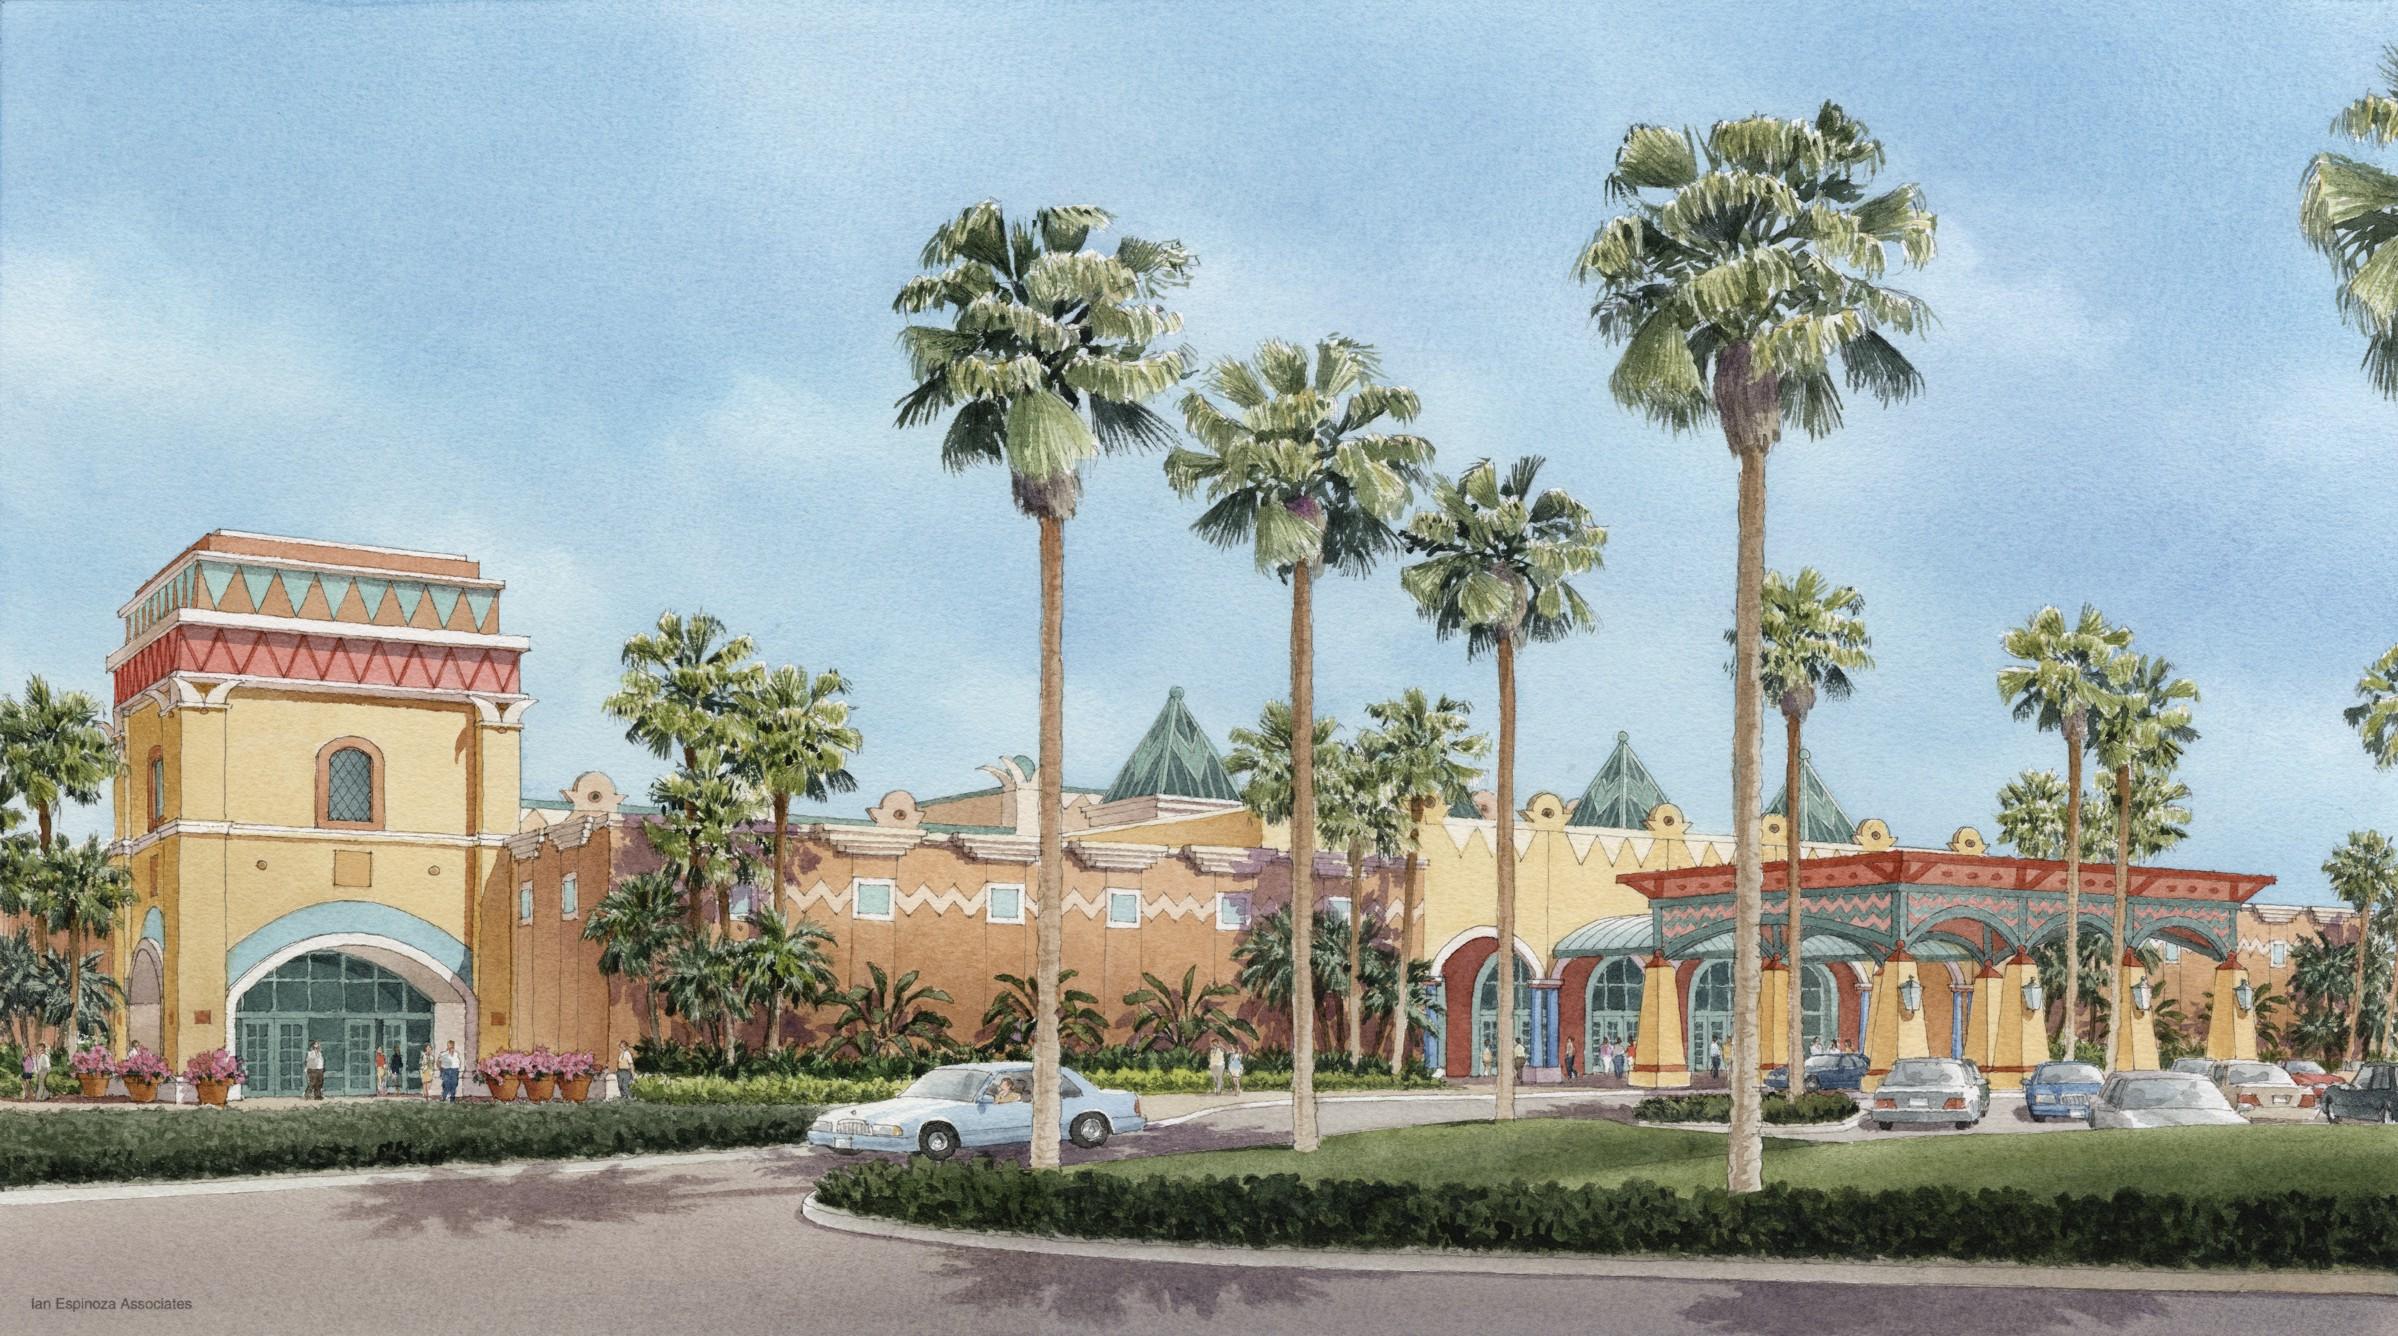 Disney's Coronado Springs Exhibit Hall